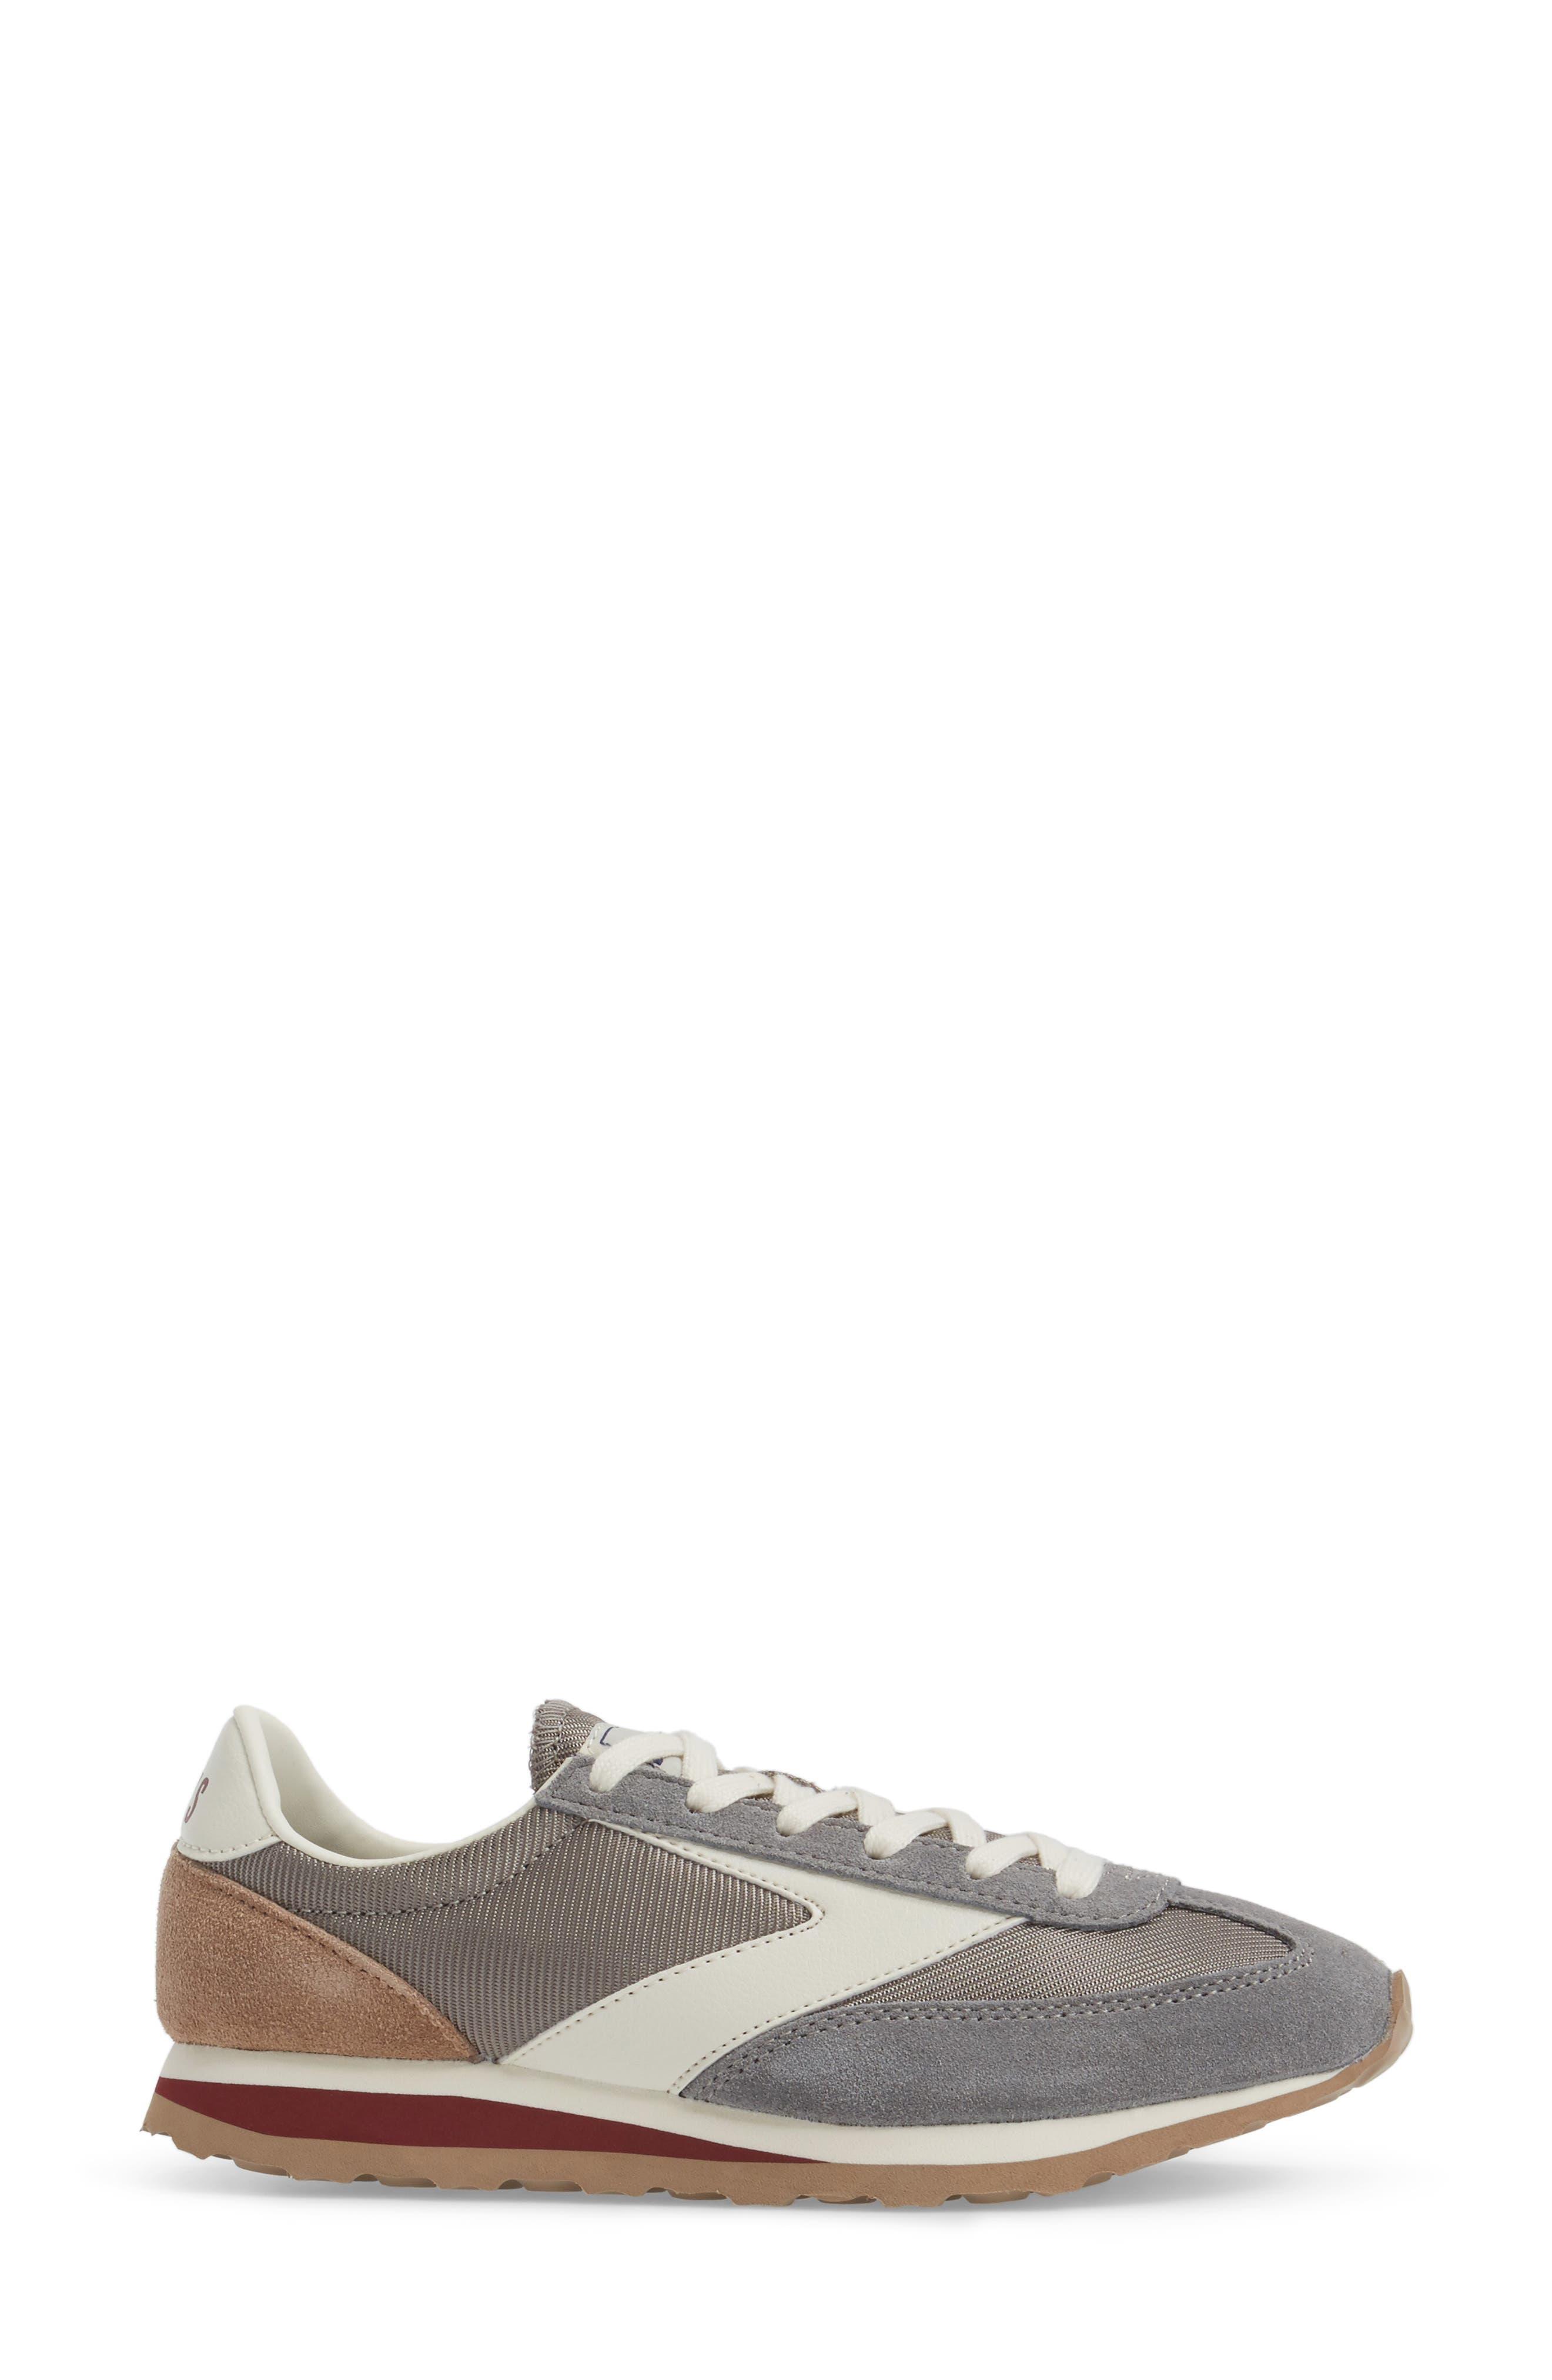 'Vanguard' Sneaker,                             Alternate thumbnail 120, color,